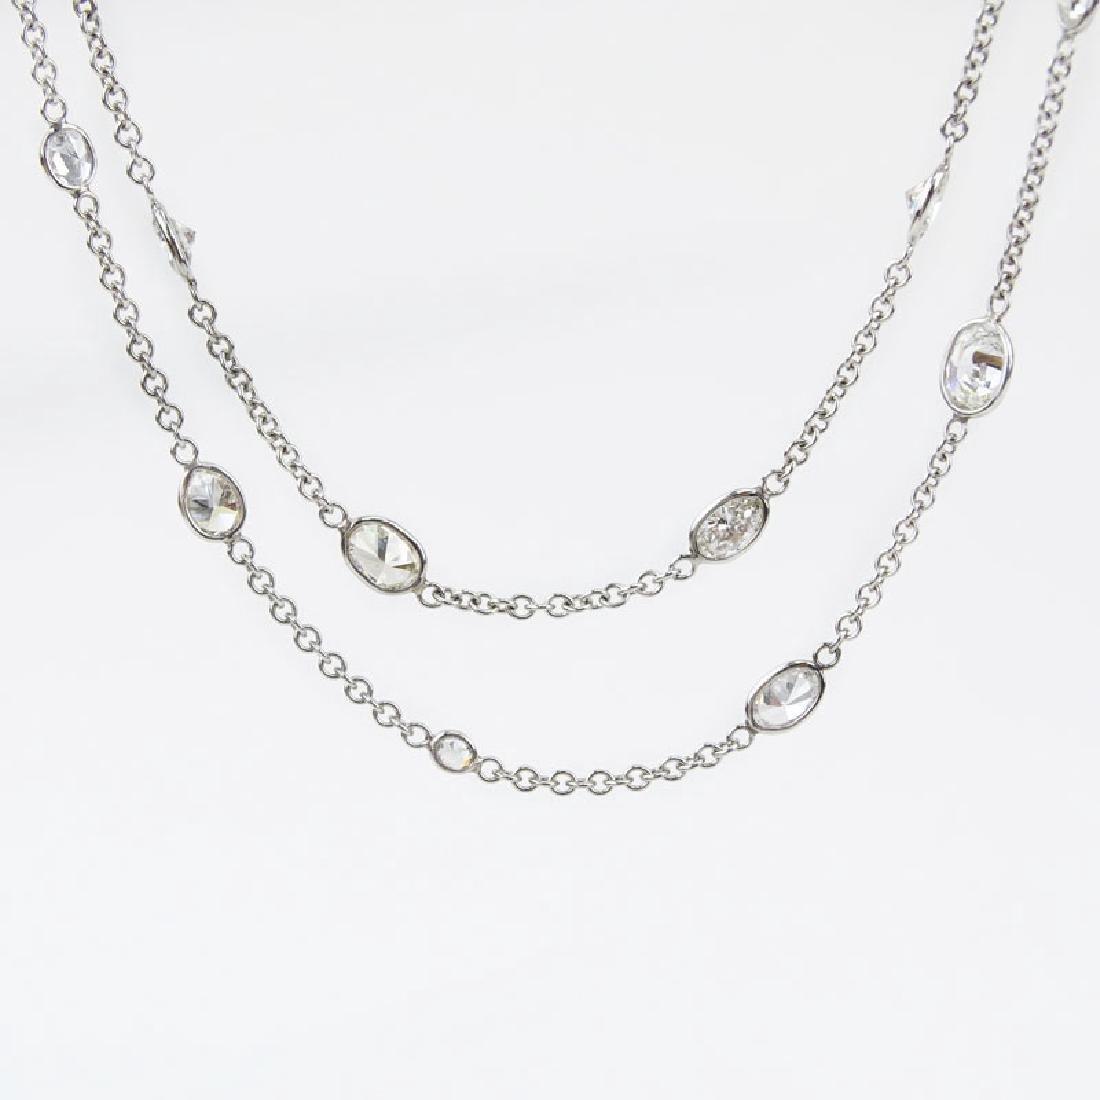 Approx. 11.50 Carat Oval Cut Diamond and 18 Karat White - 2